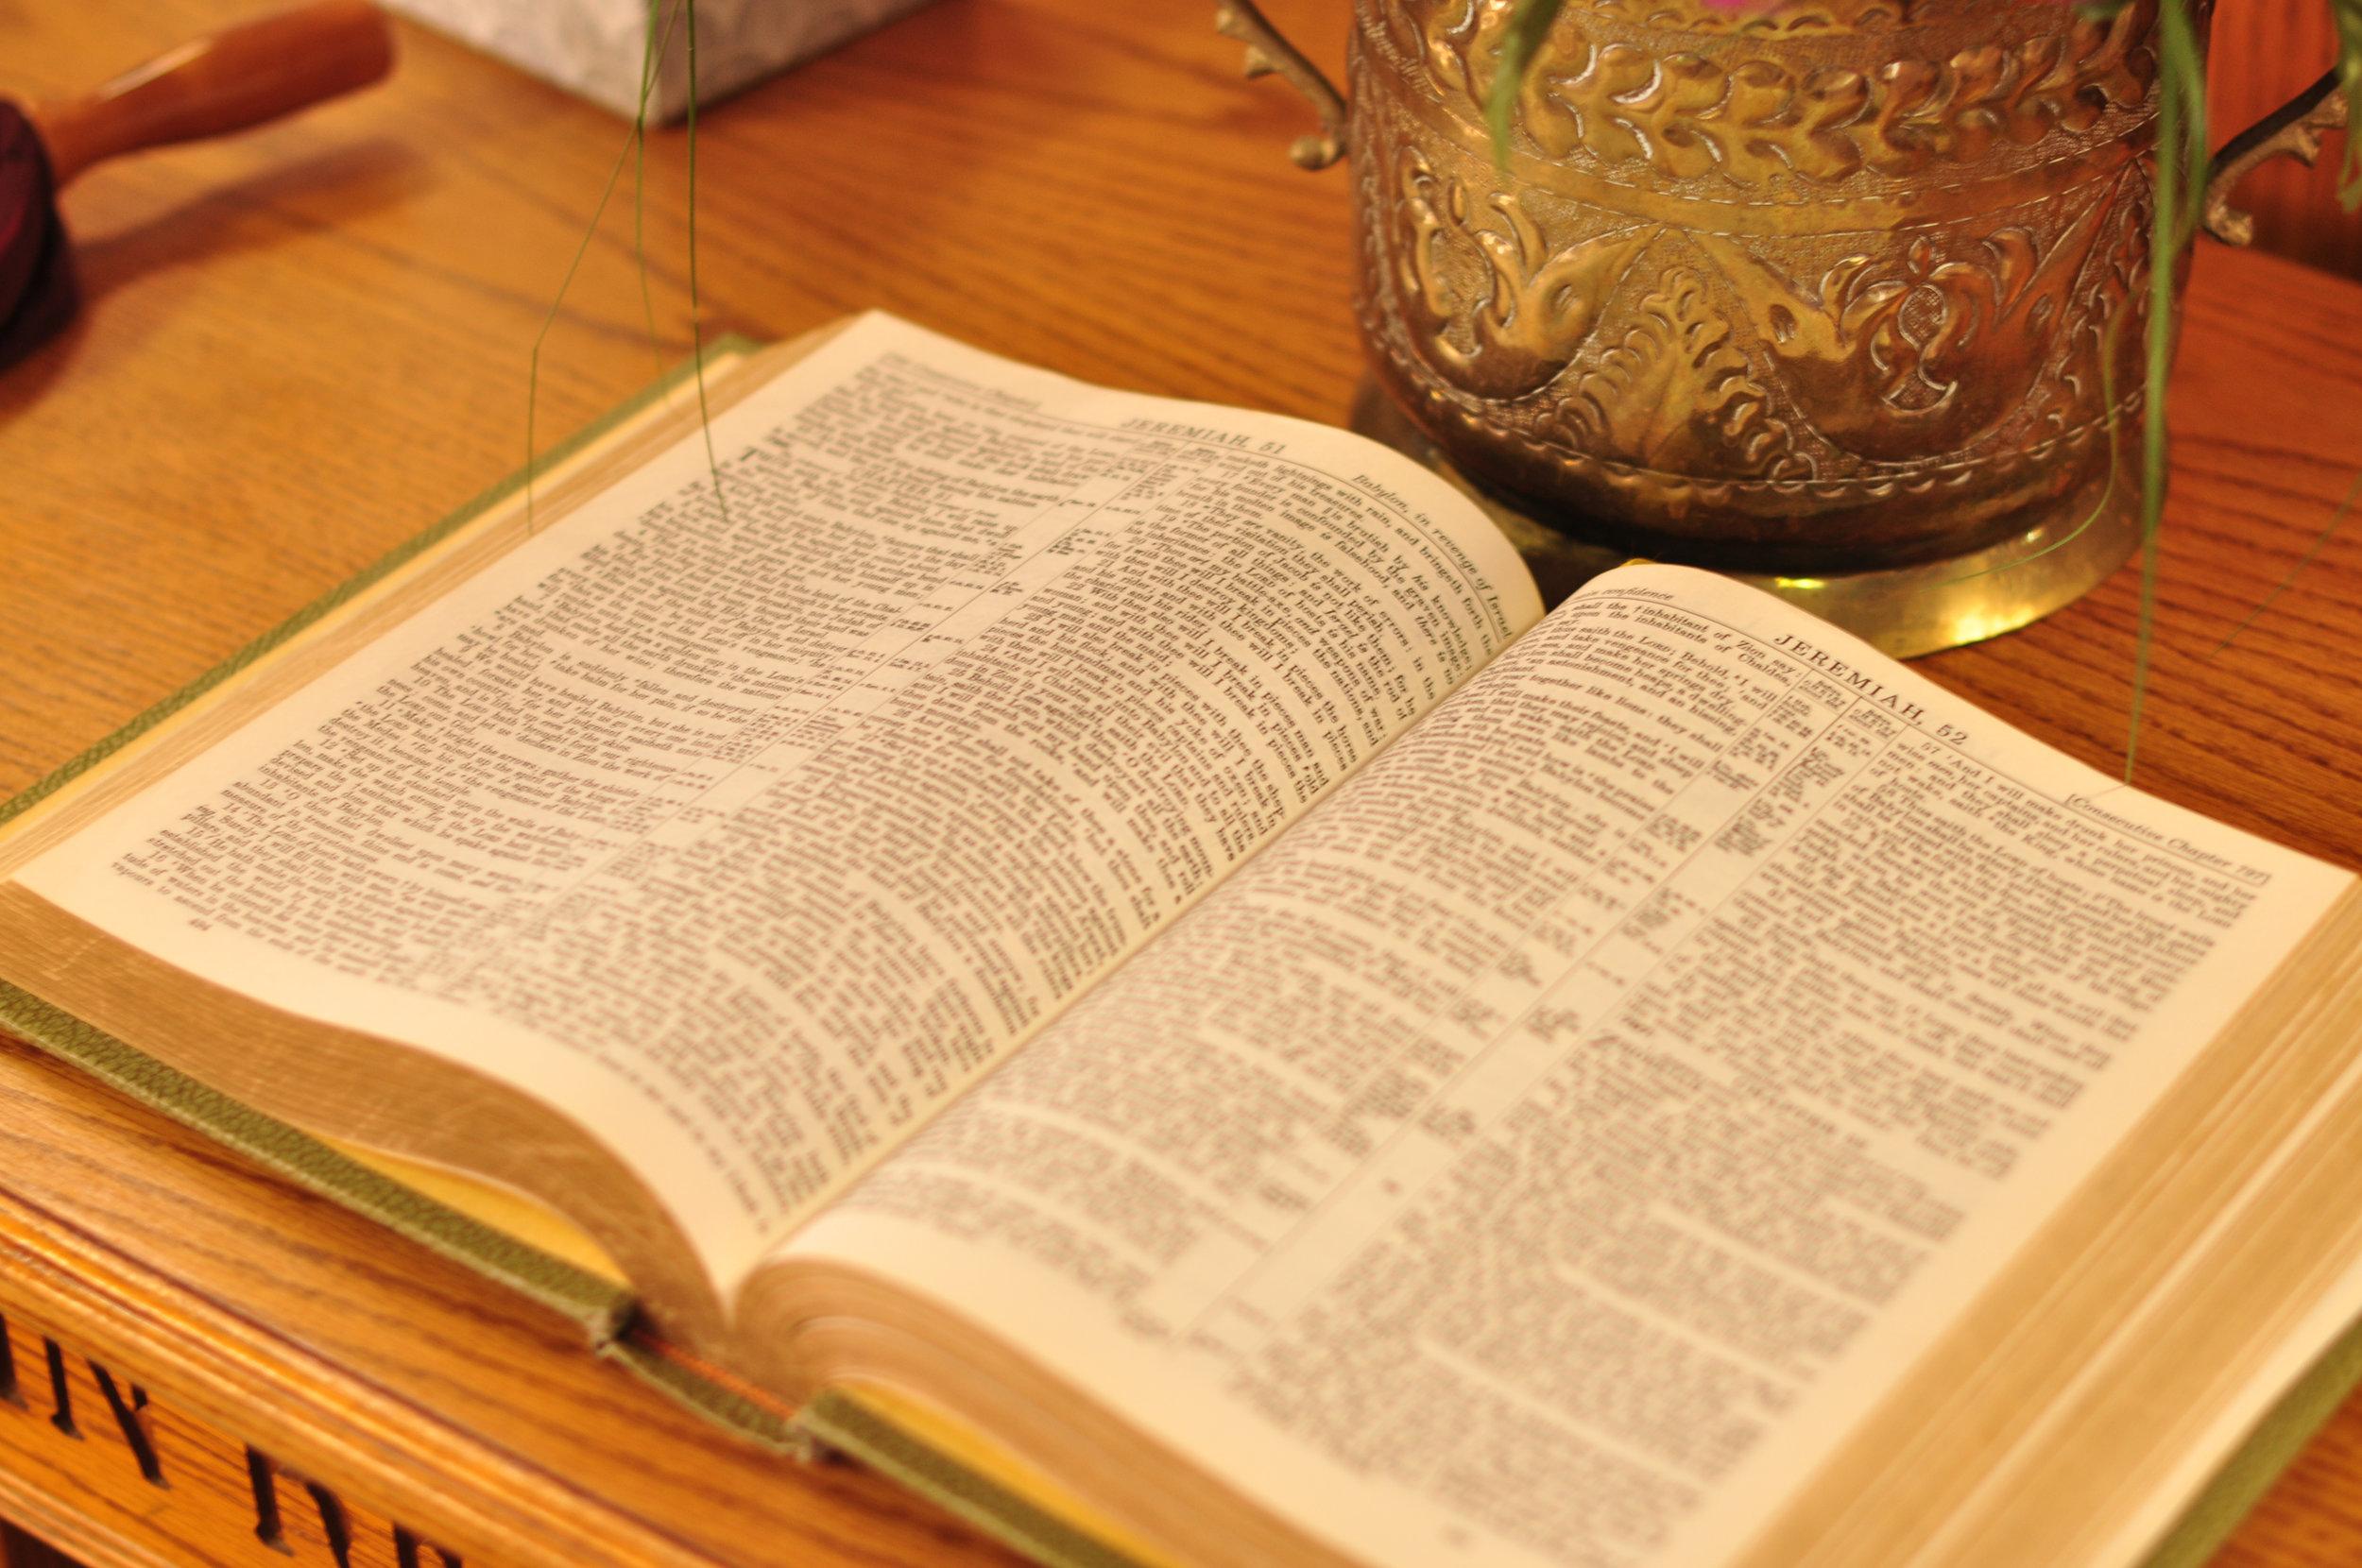 bible-closeup.jpg